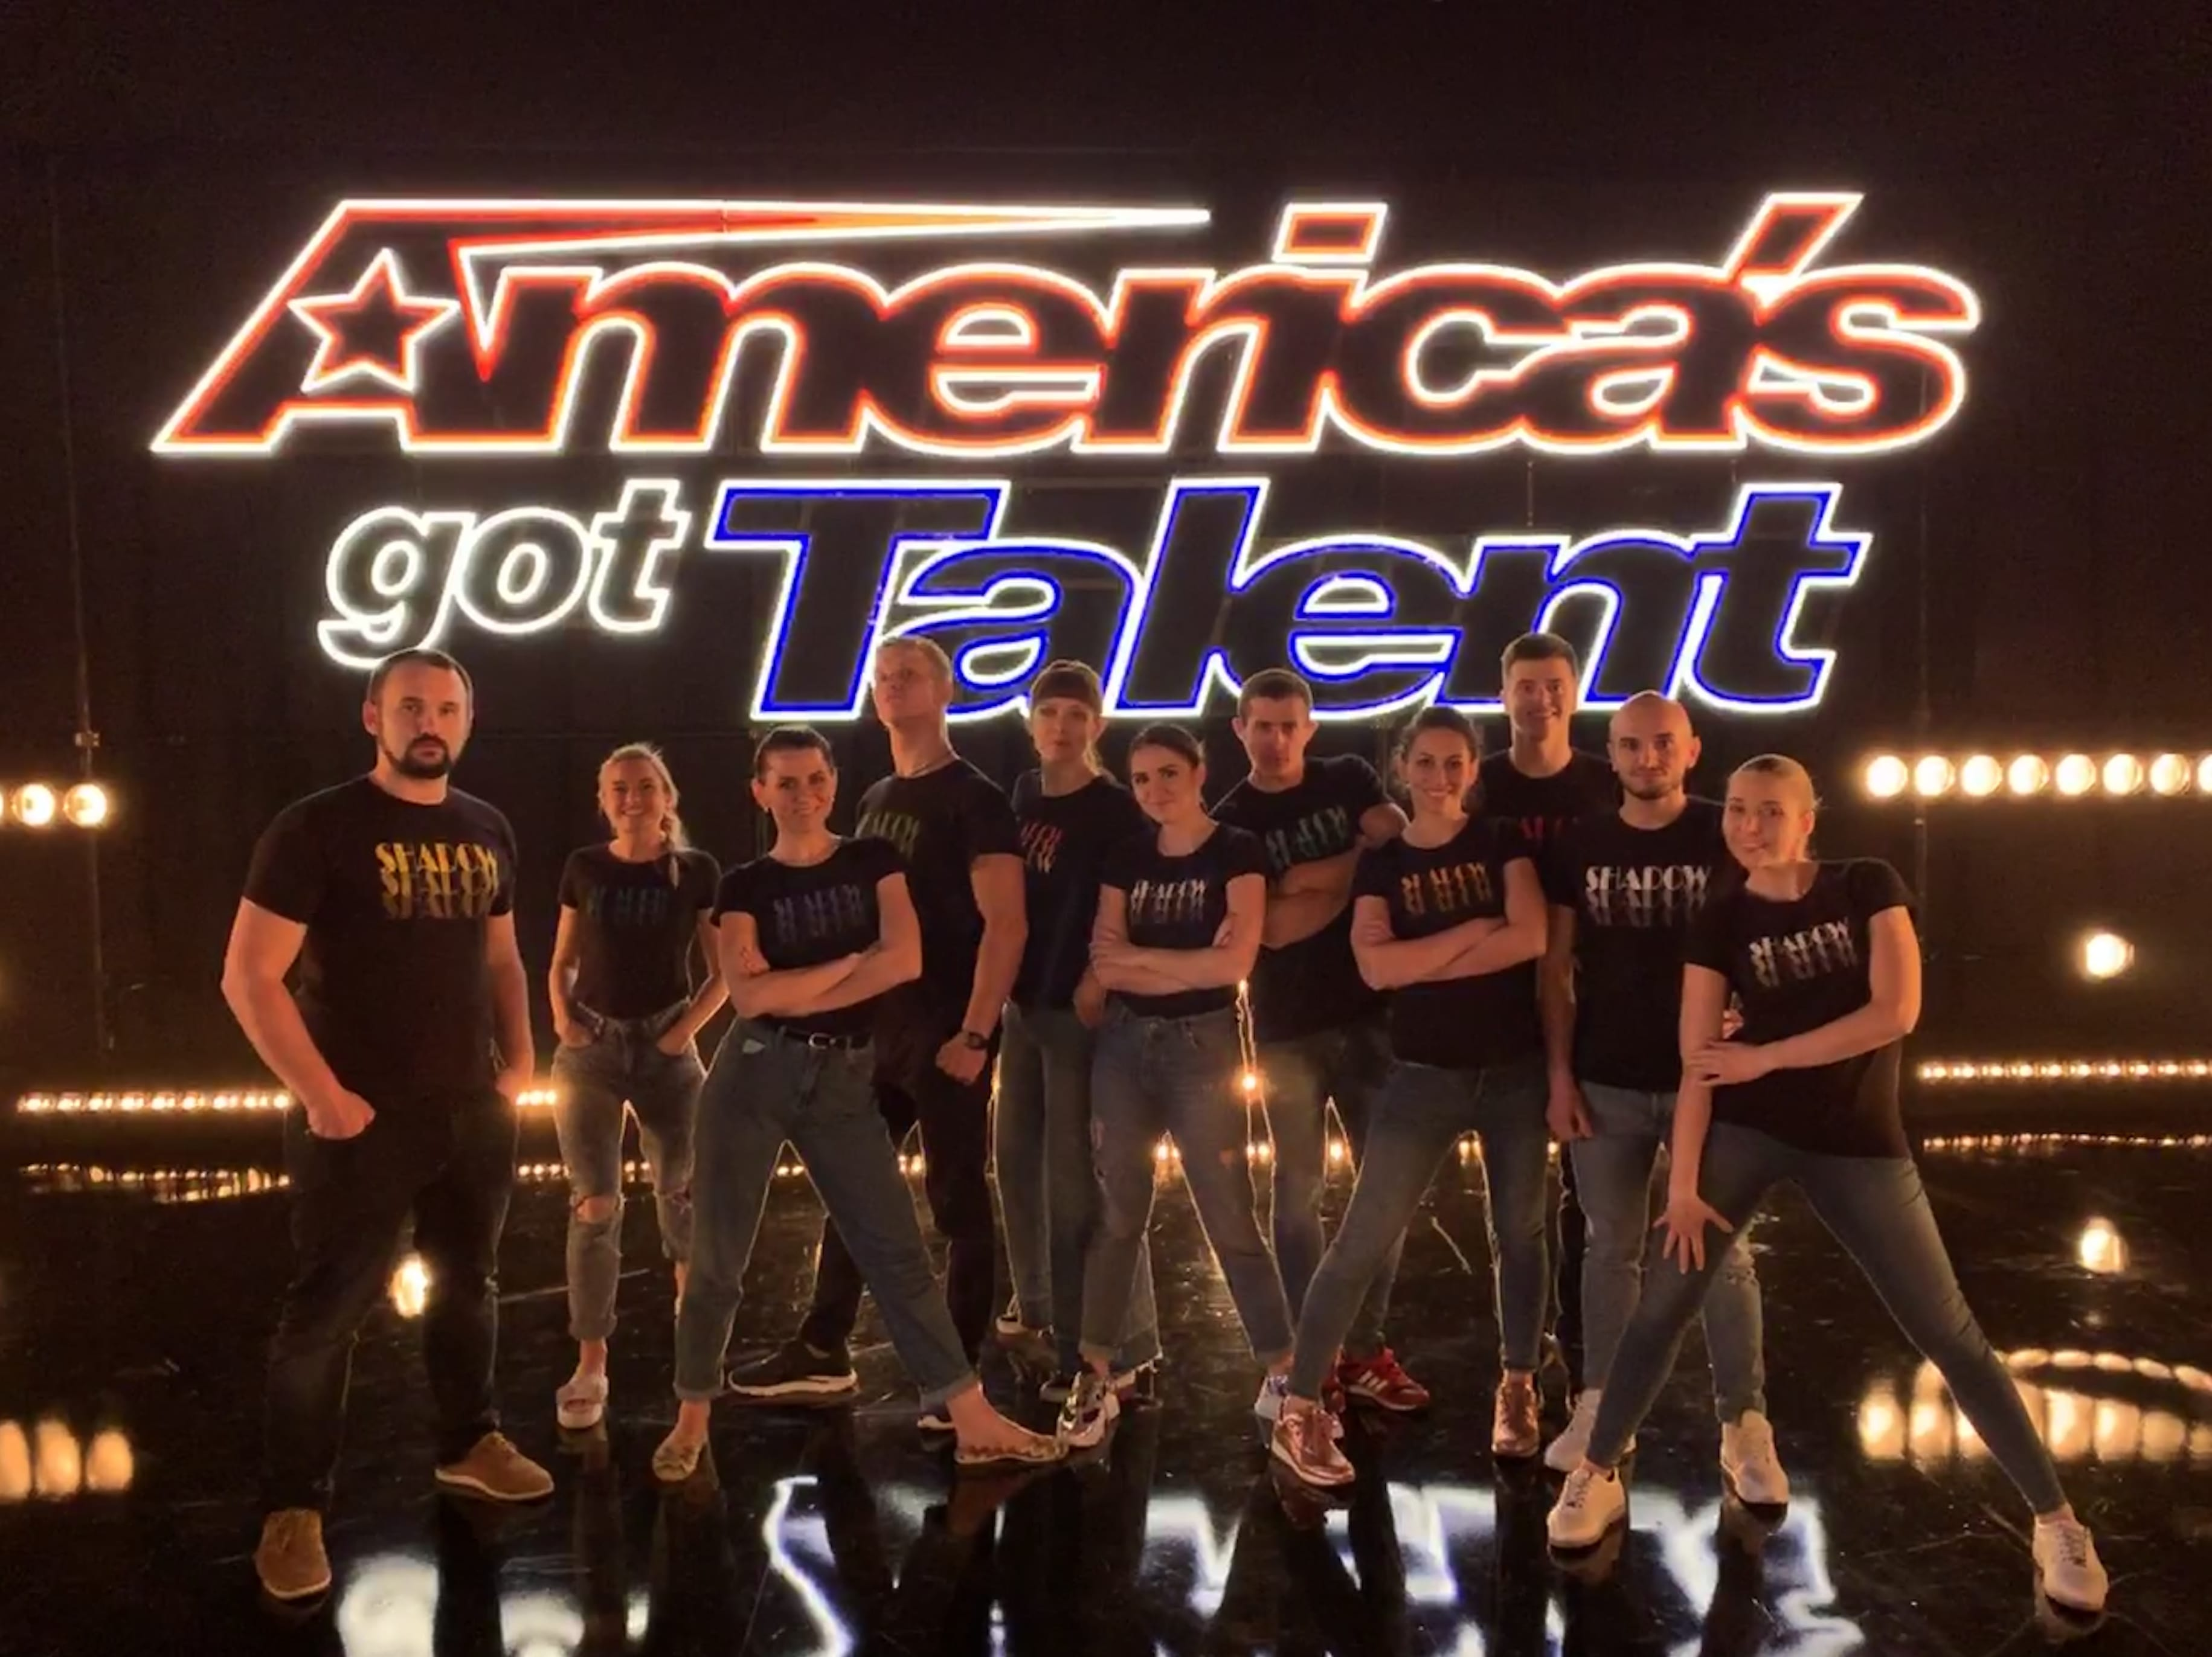 украинцы на америка имеет талант, verba shadow on america's got talent, українці на америка має талант